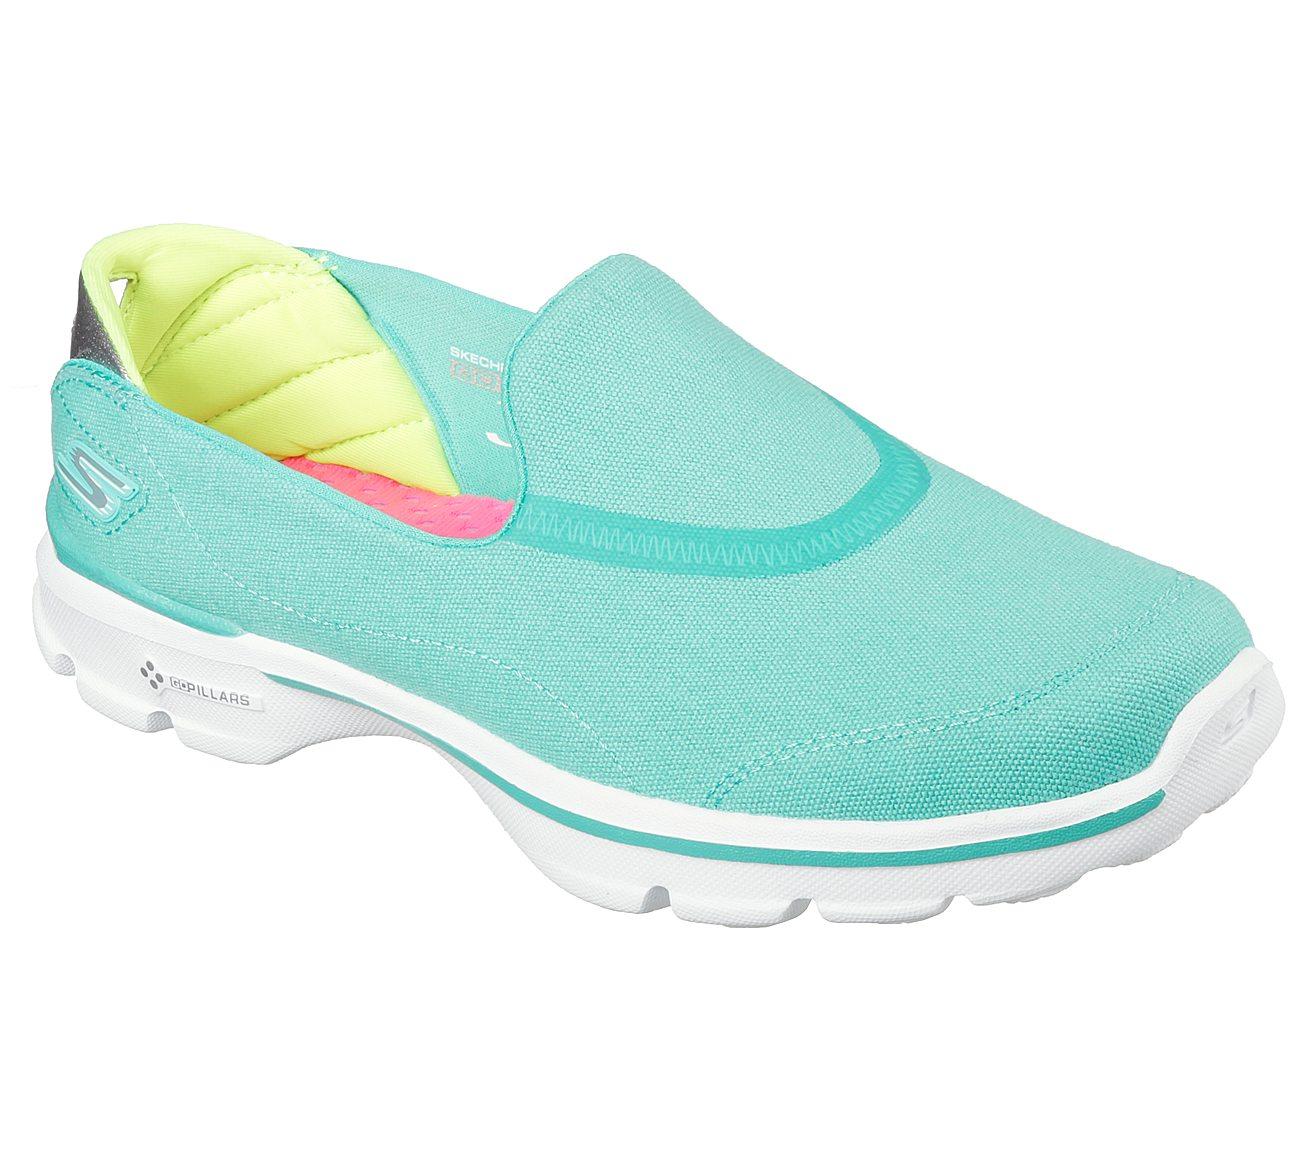 Buy SKECHERS Skechers GOwalk 3 - Spring